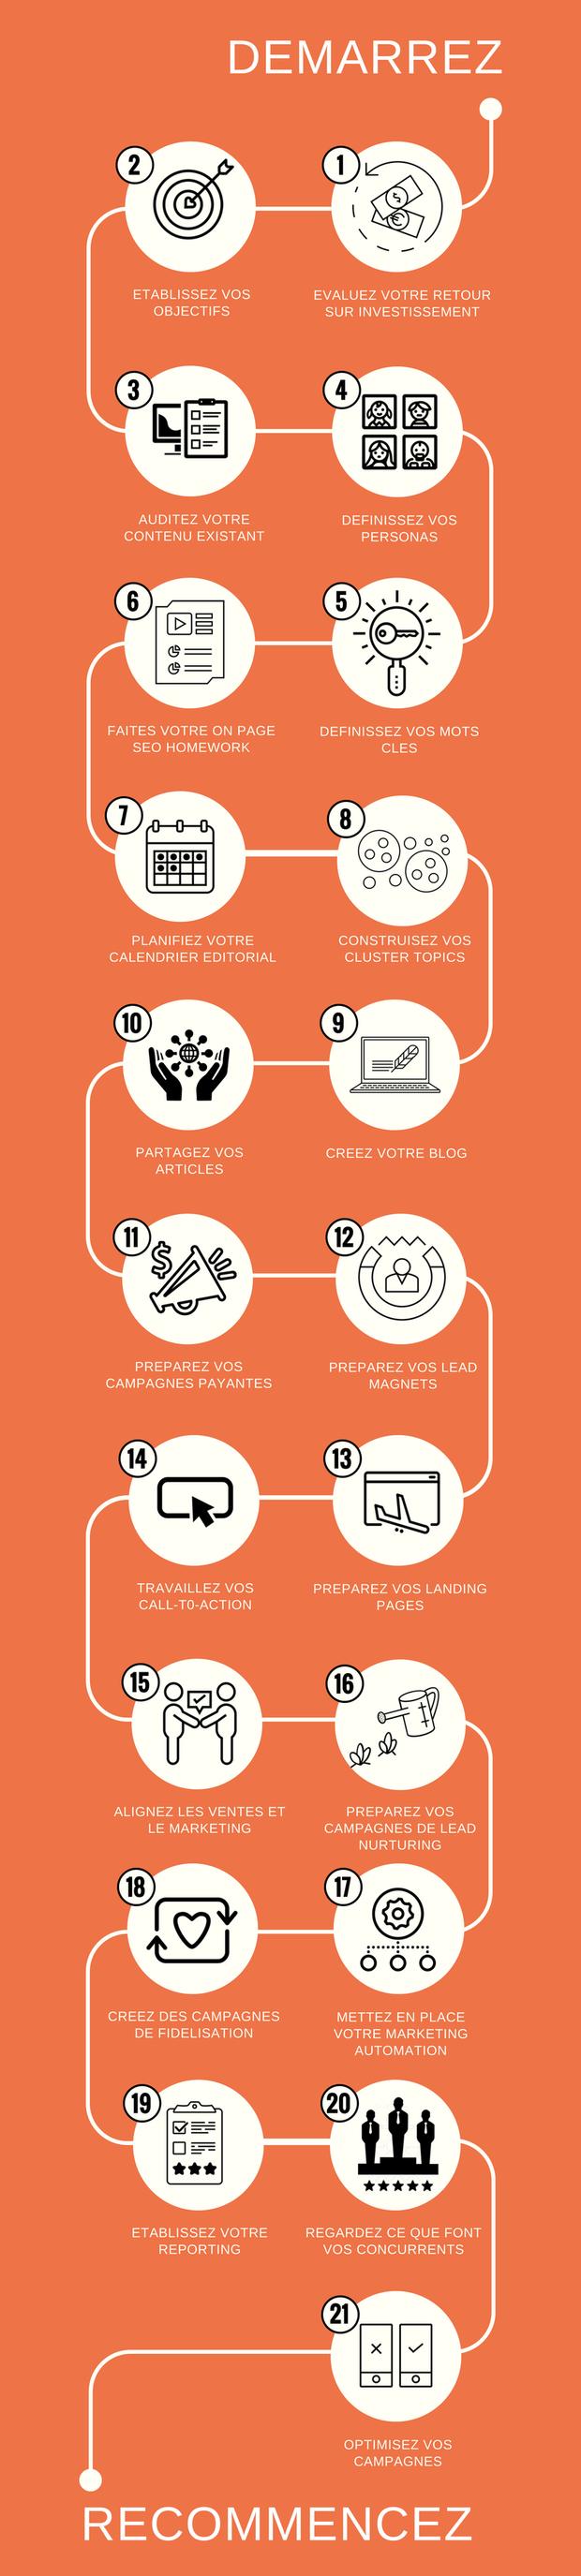 Réussir ses campagnes d'inbound marketing en 21 étapes